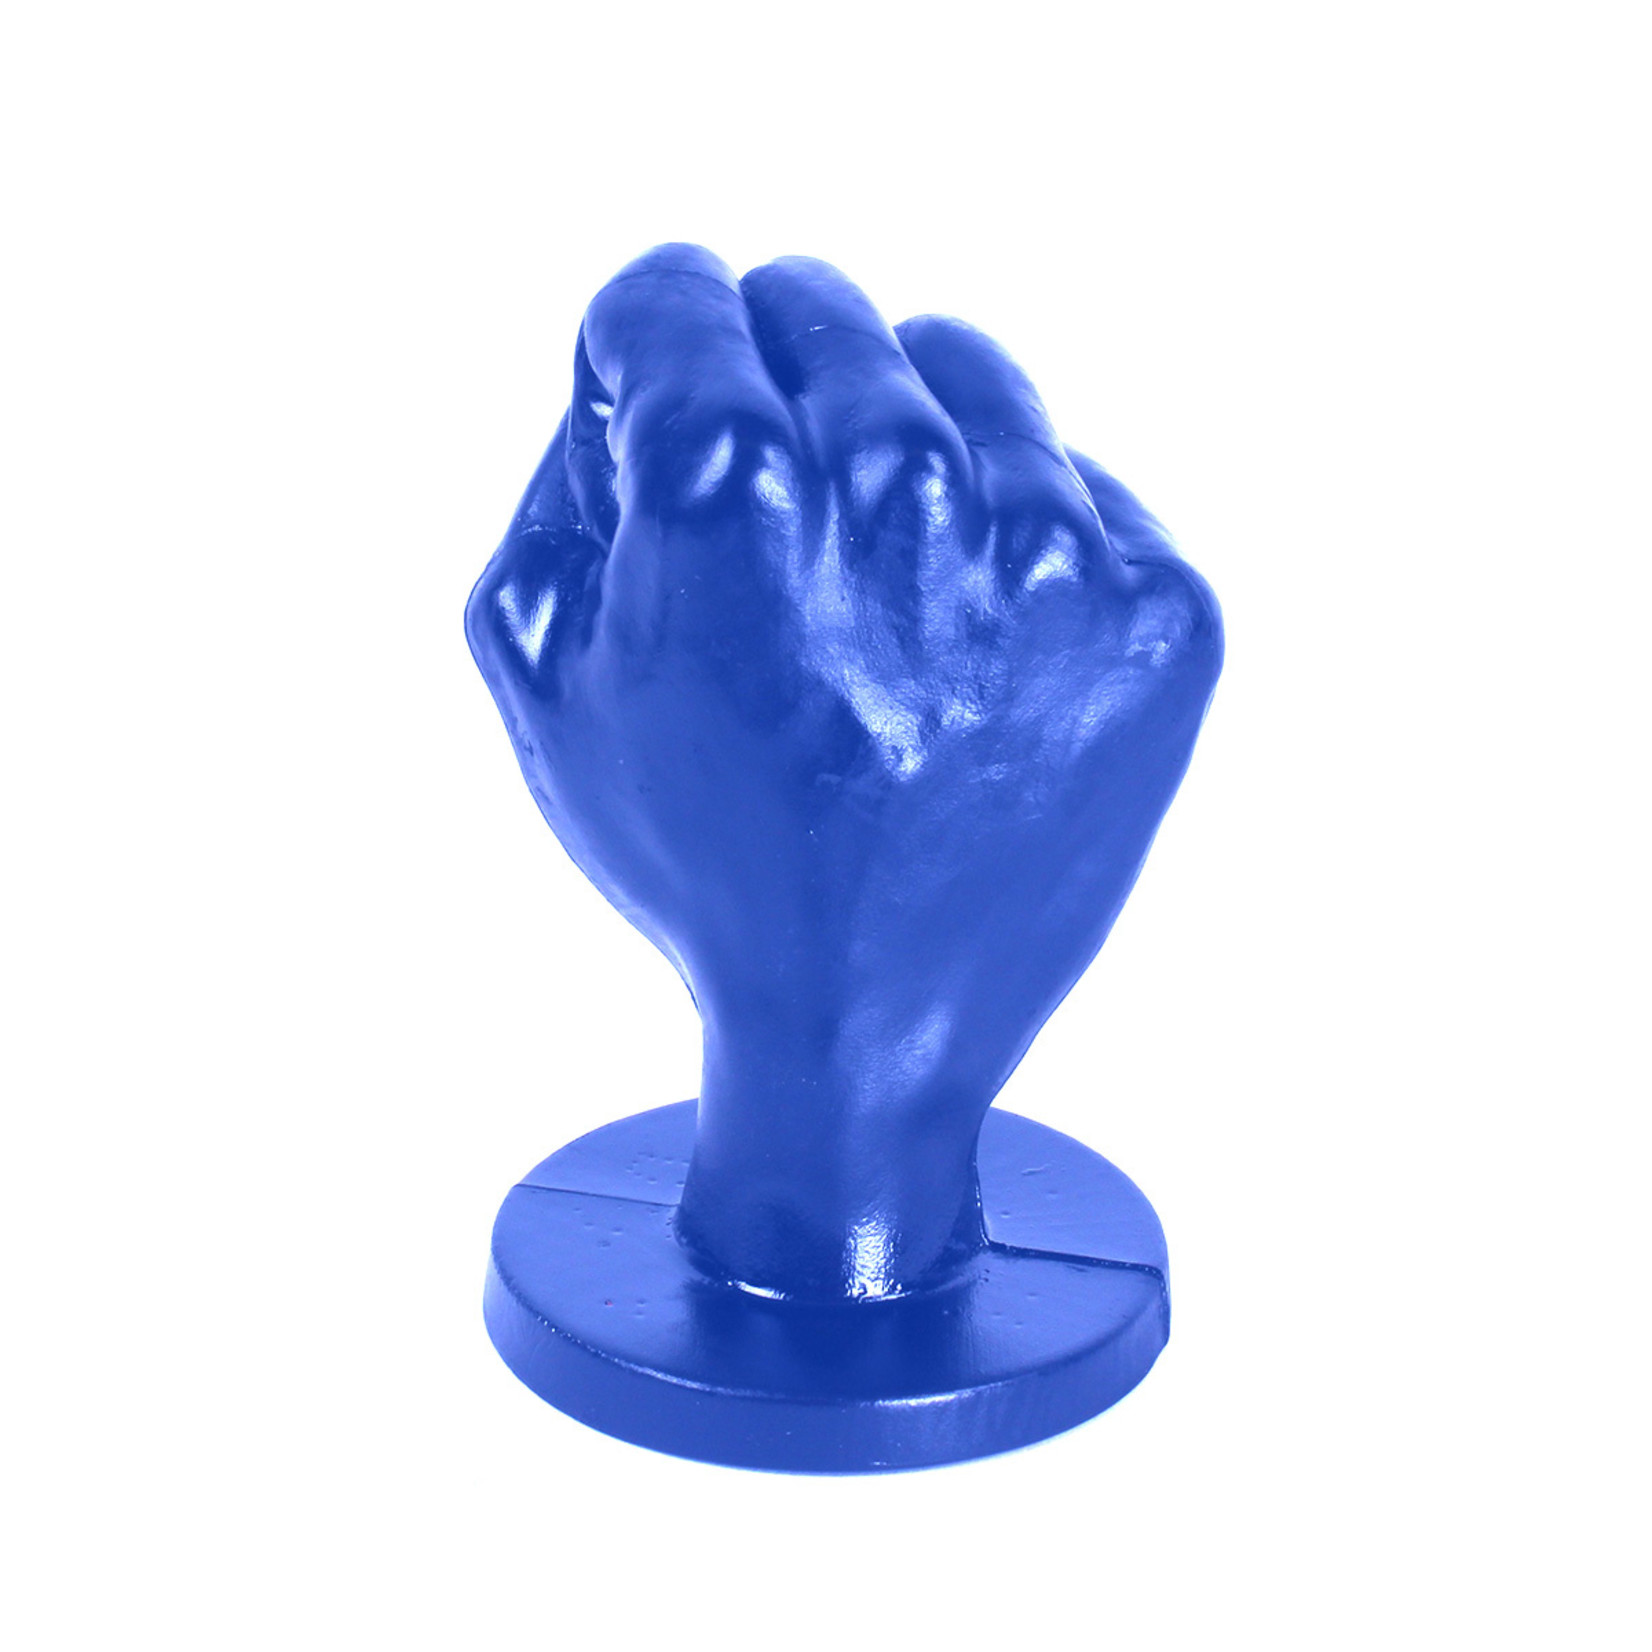 All Black All Blue Fist Medium - ABB93